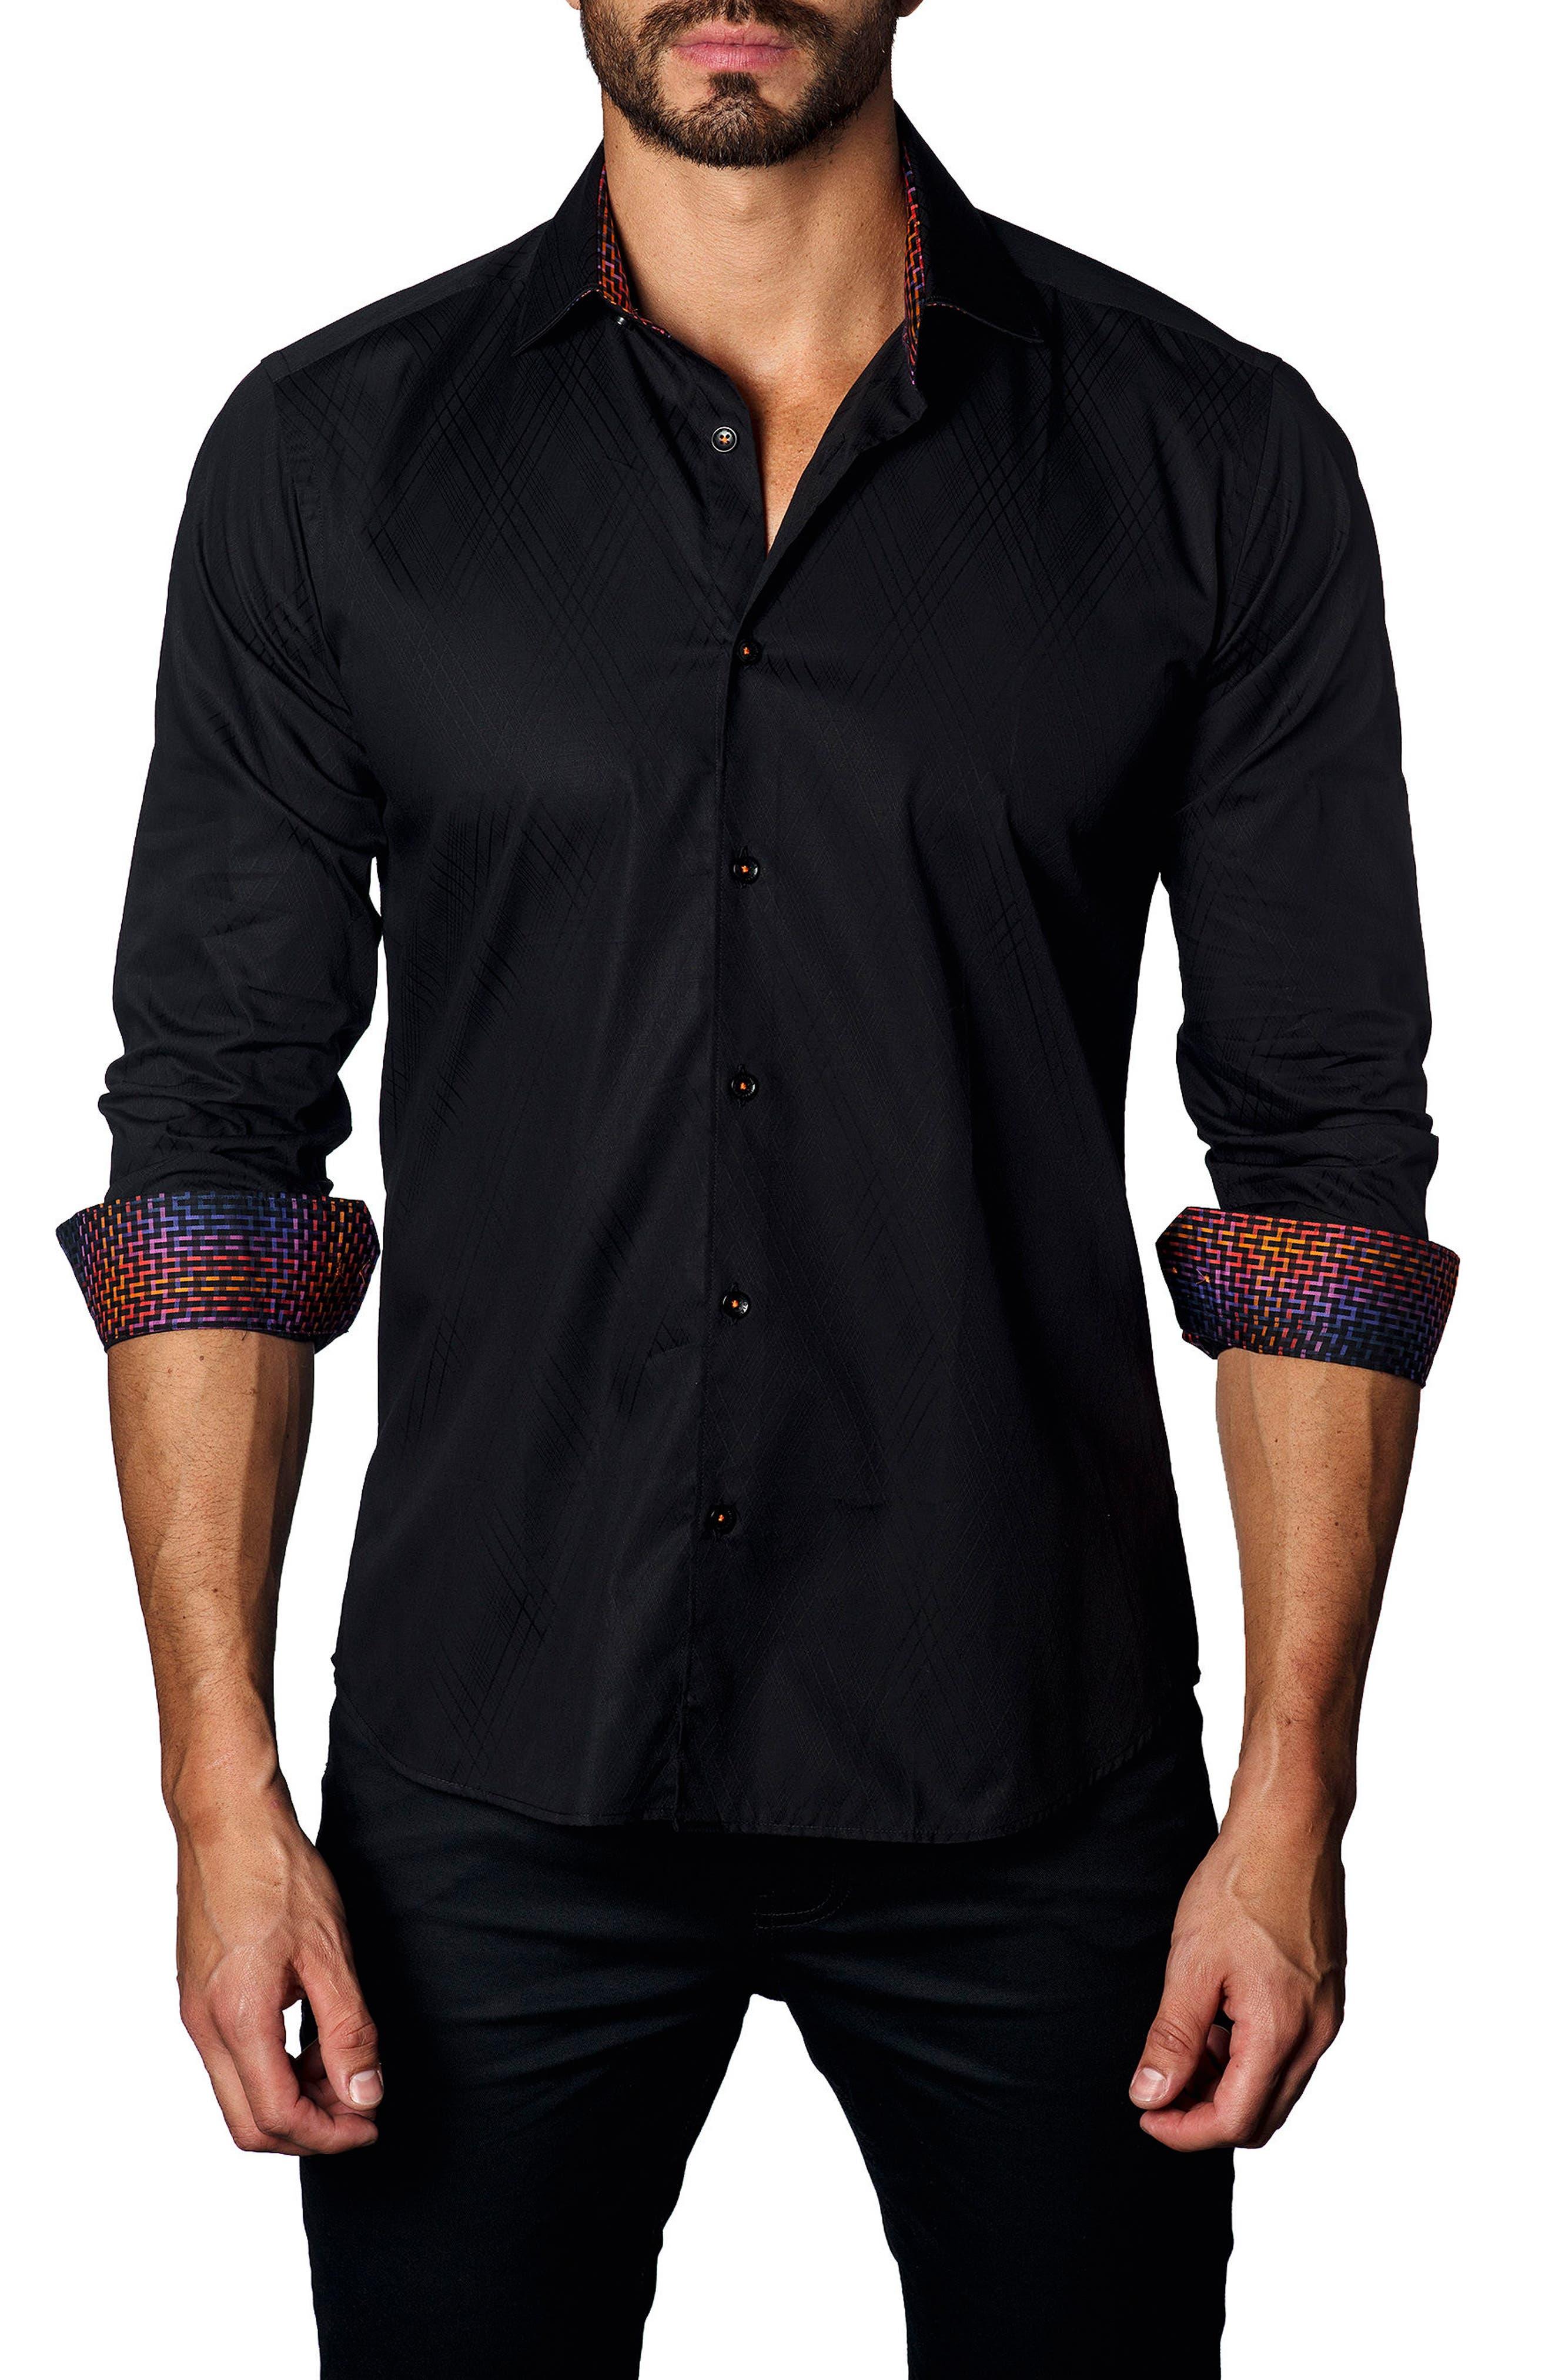 Trim Fit Diamond Jacquard Sport Shirt by Jared Lang